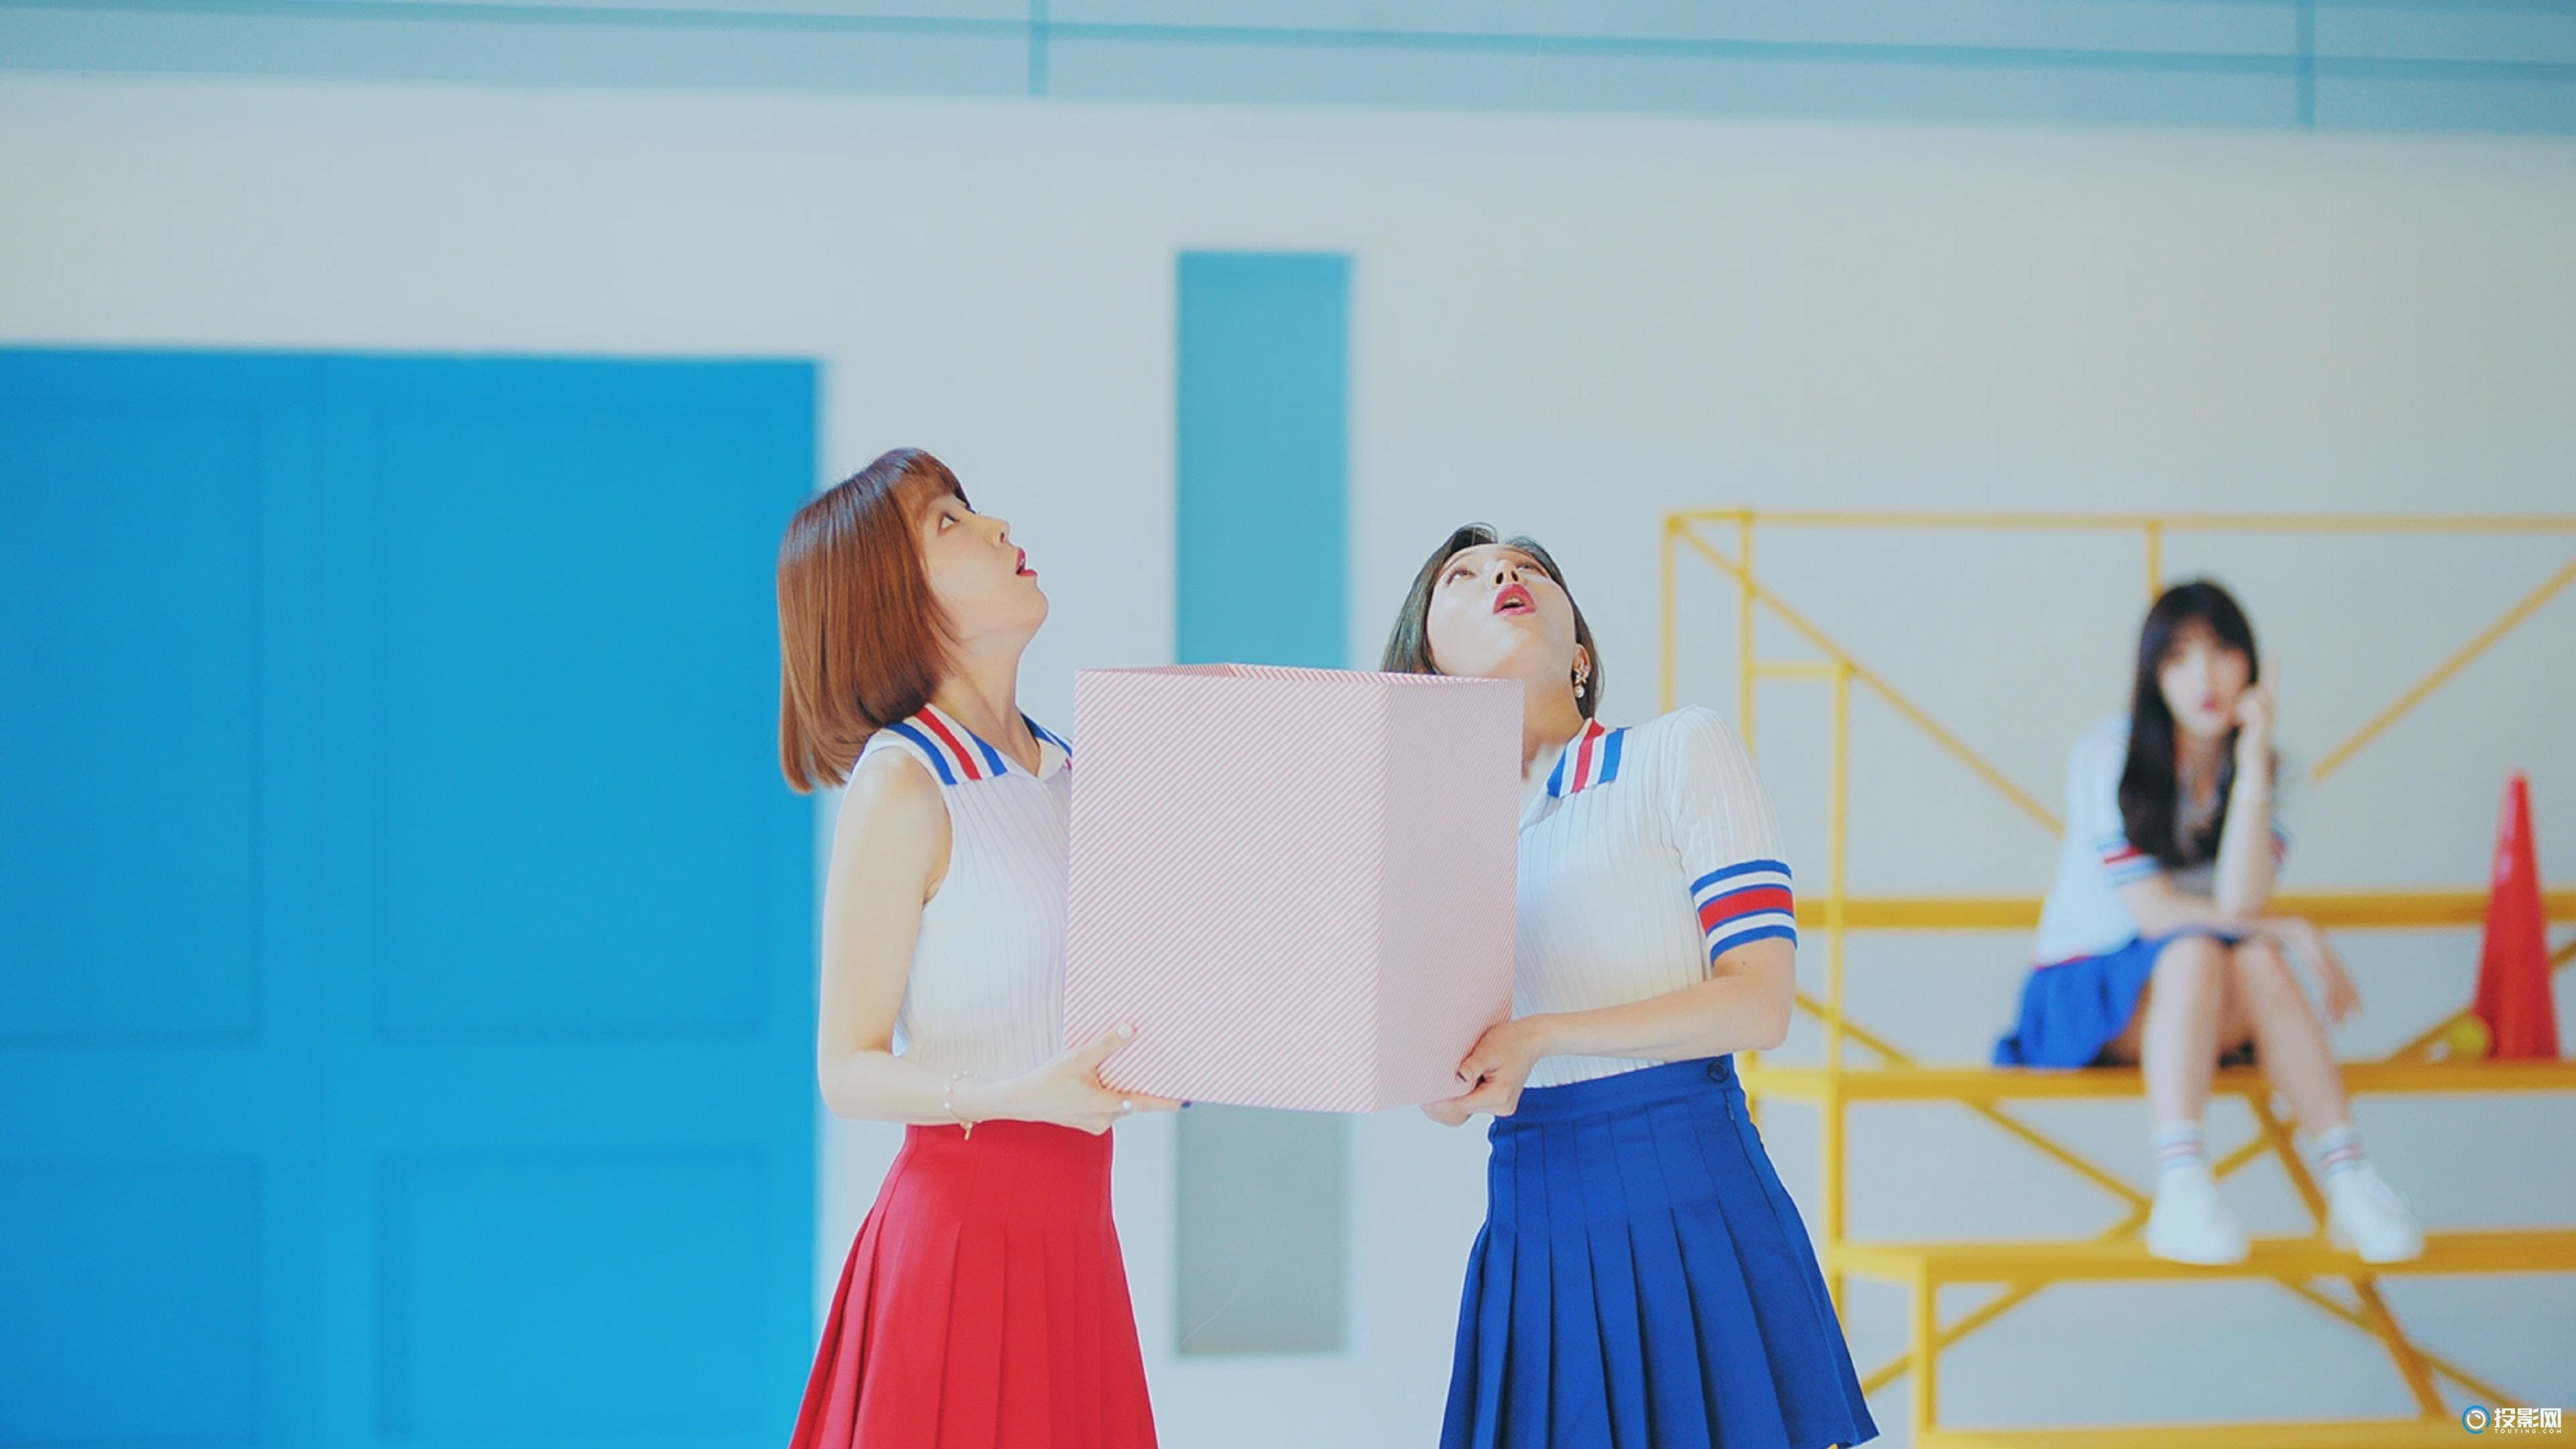 LABOUM - Hwi Hwi (Master)  4K韩国MV视频下载